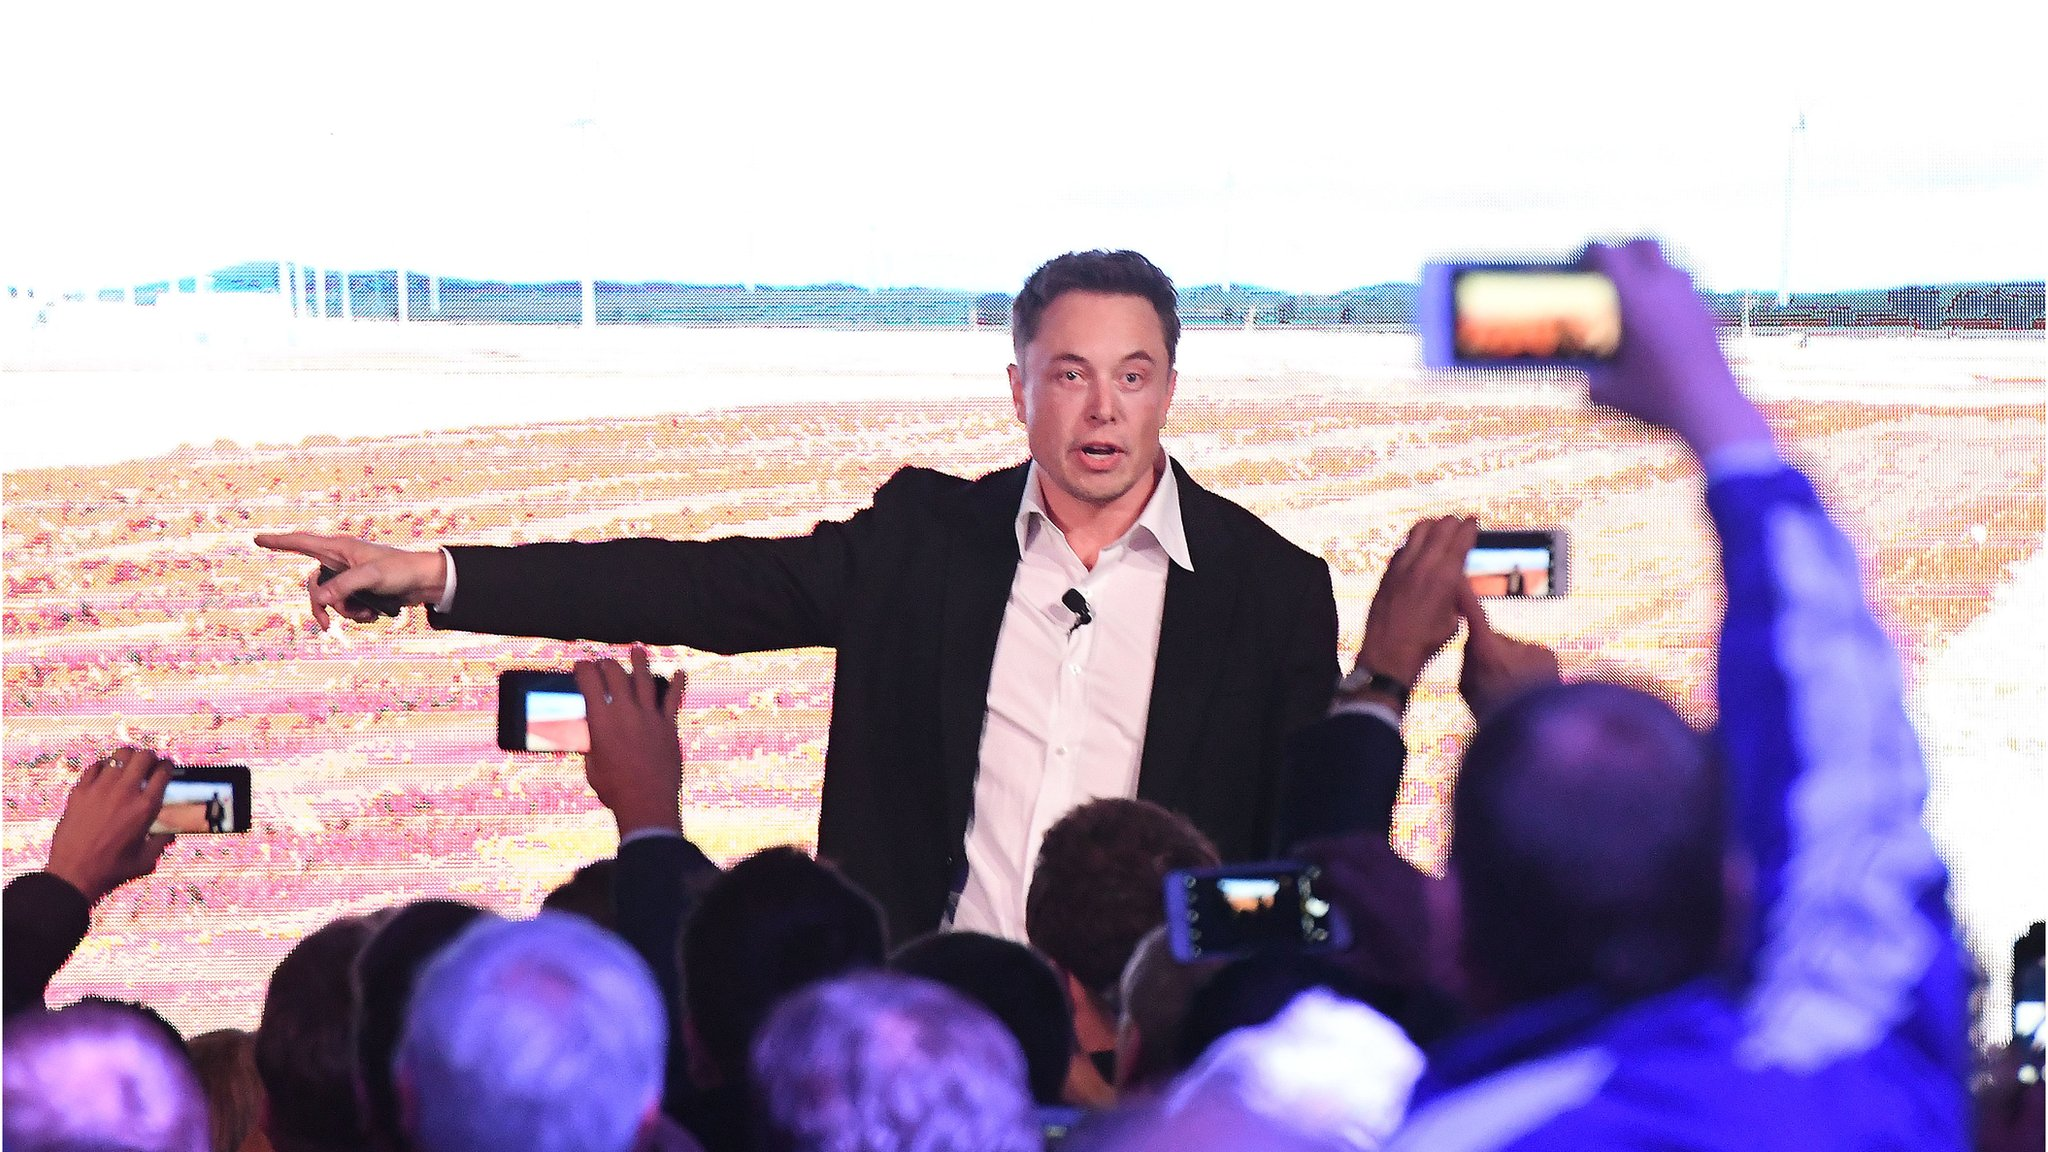 Tesla sues former worker for hacking